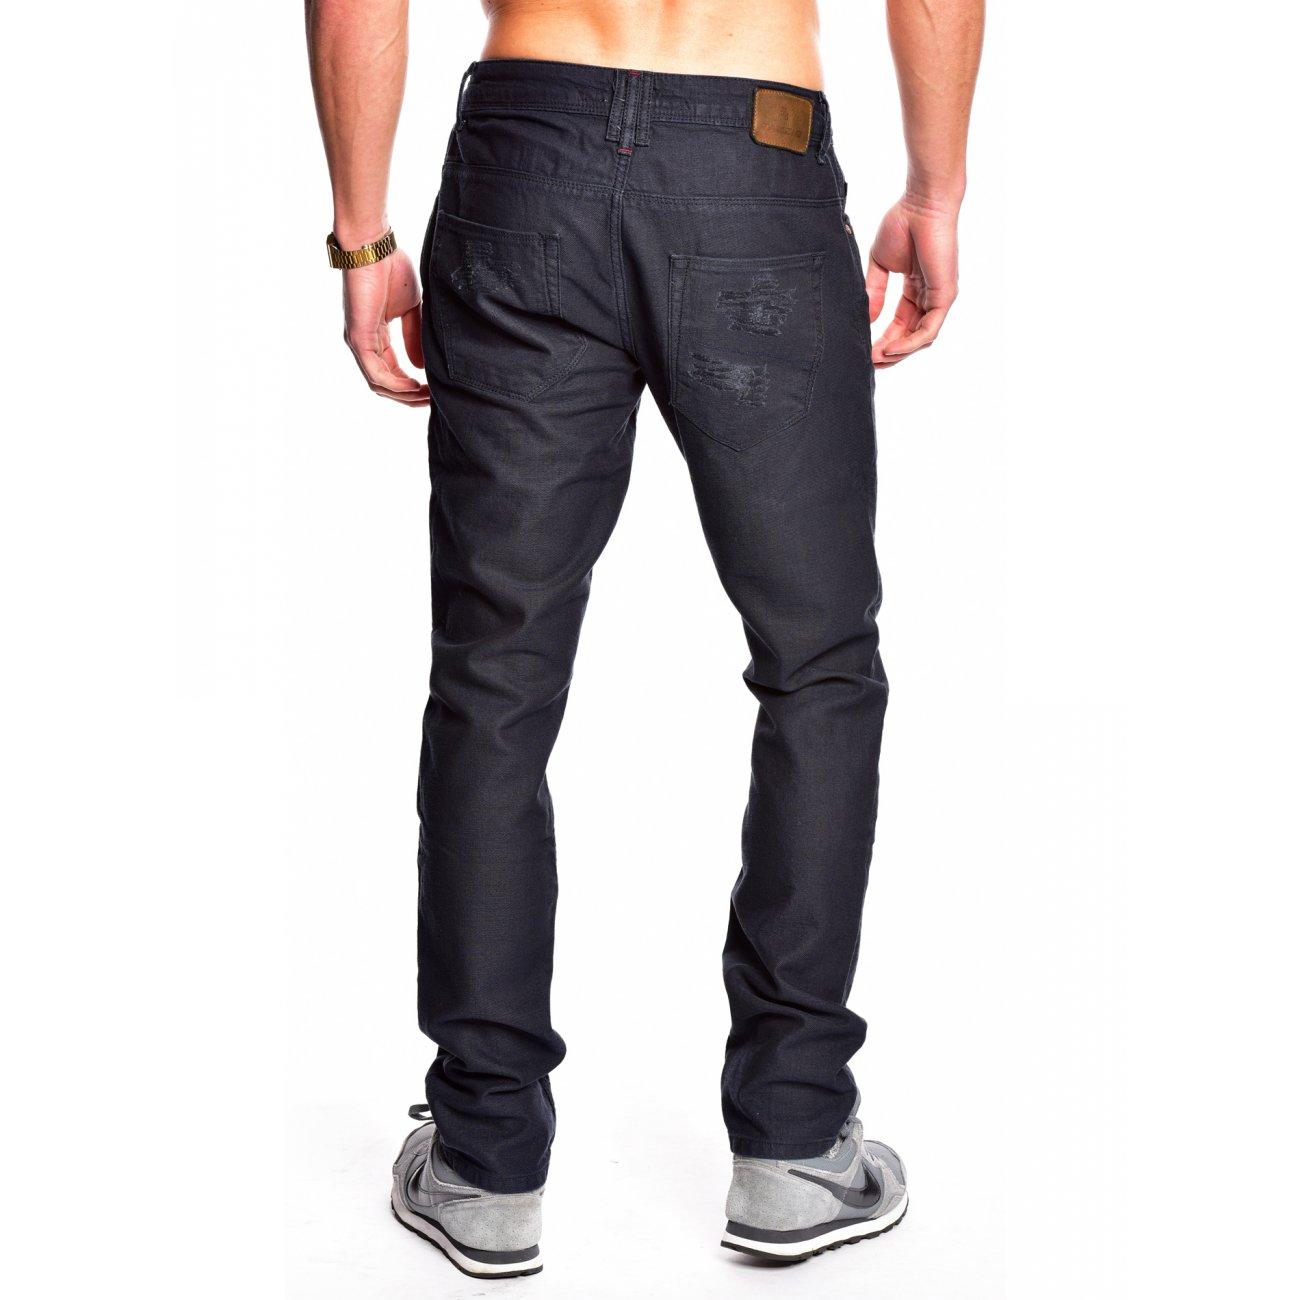 herren jeans dunkelblau tazzio 505 jeans herren g nstig. Black Bedroom Furniture Sets. Home Design Ideas